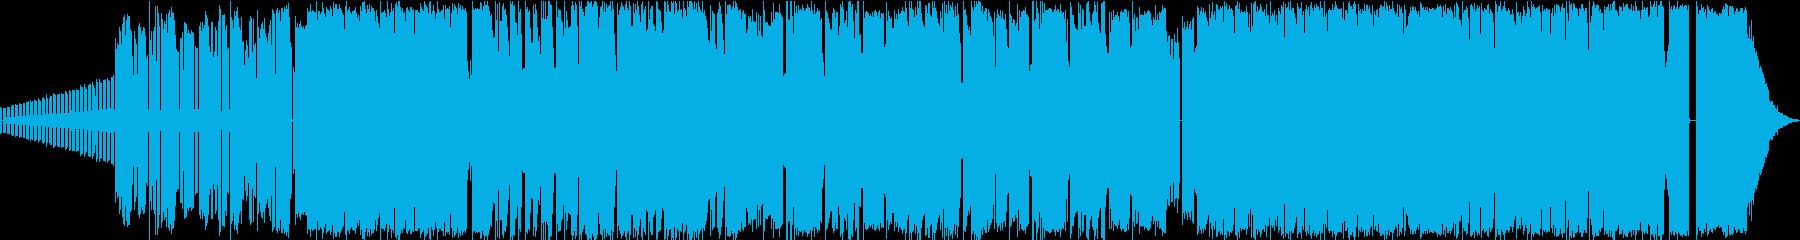 8bit系ポップでファンシーなチップチュの再生済みの波形